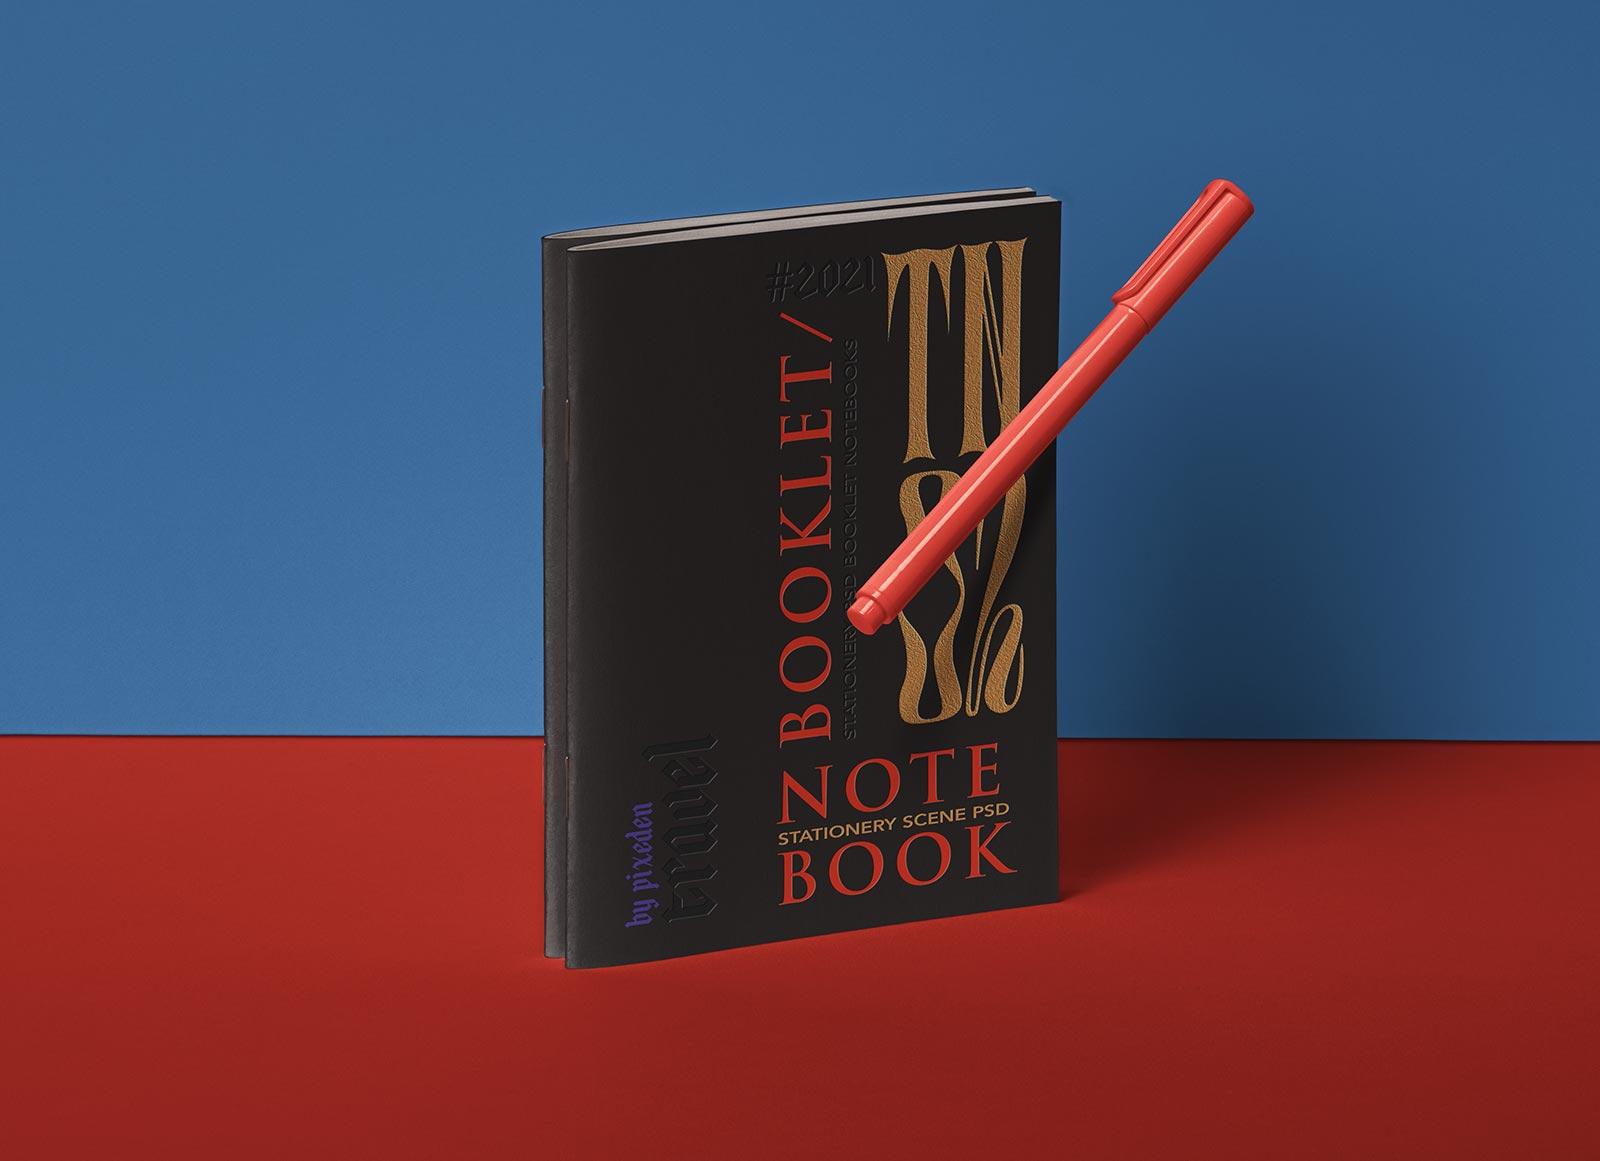 Travel-Booklet-Notebook-Stationery-Mockup